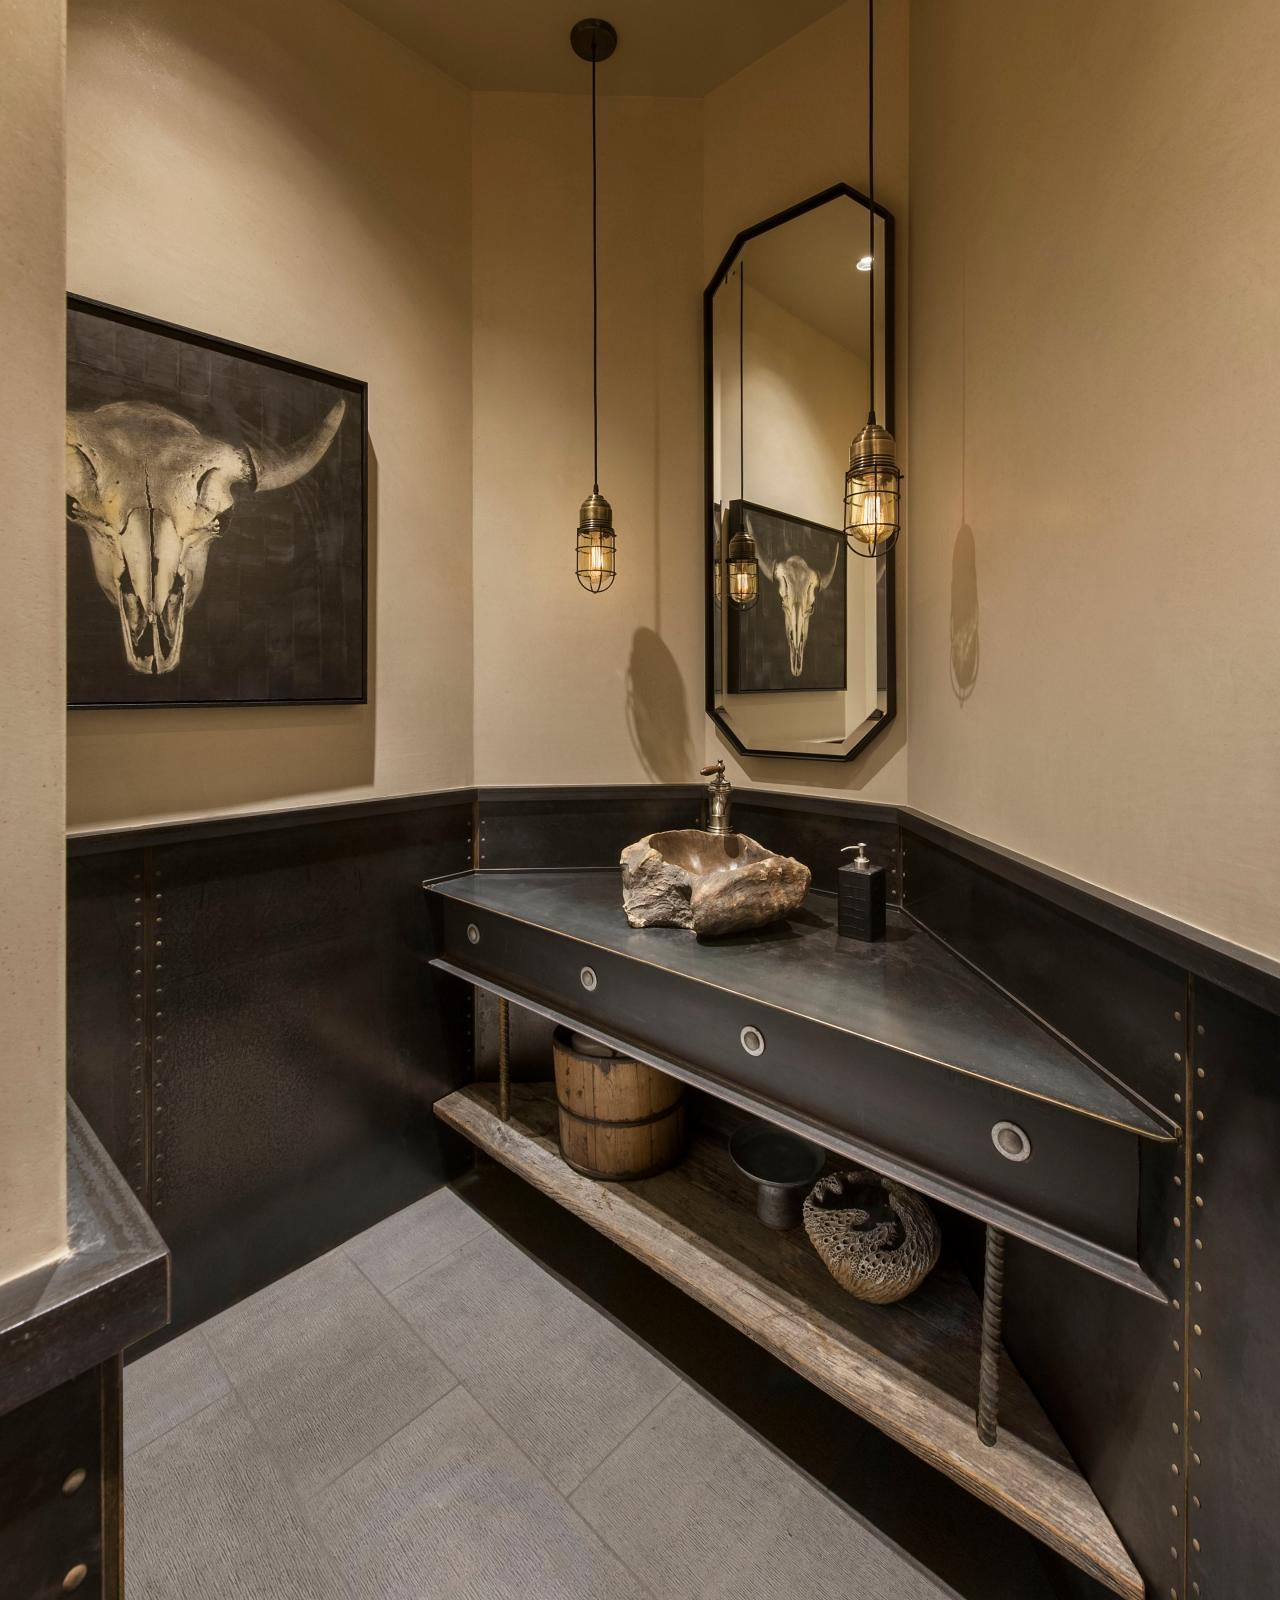 bathroom fans middot rustic pendant. Bathroom Fans Middot Rustic Pendant Photo Page | HGTV